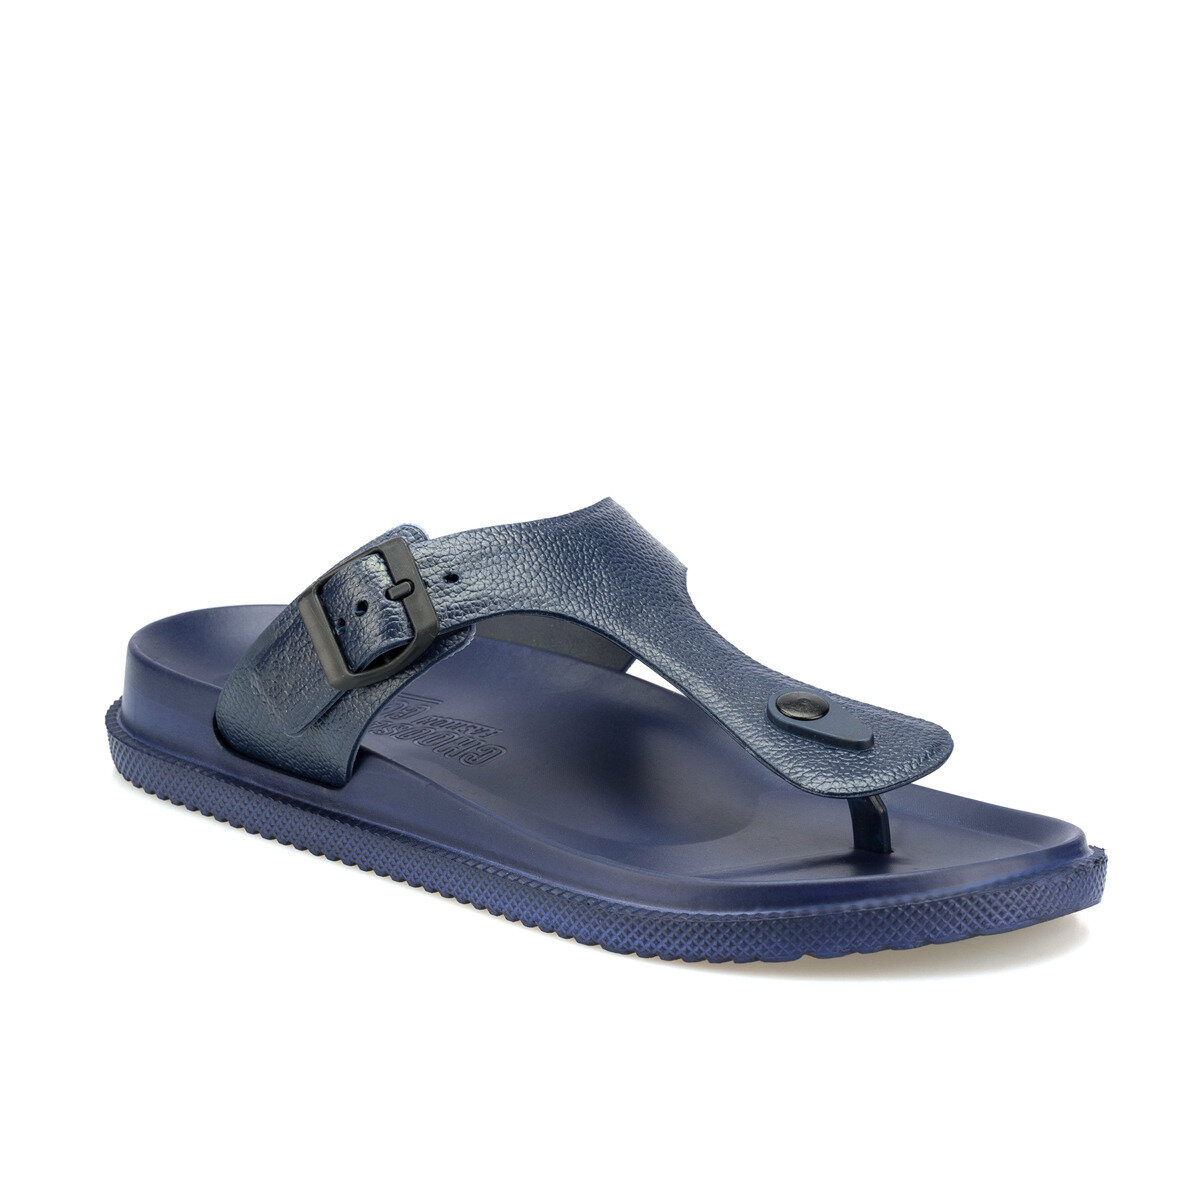 FLO 400330.M Navy Blue Men 'S Thong Slippers Polaris